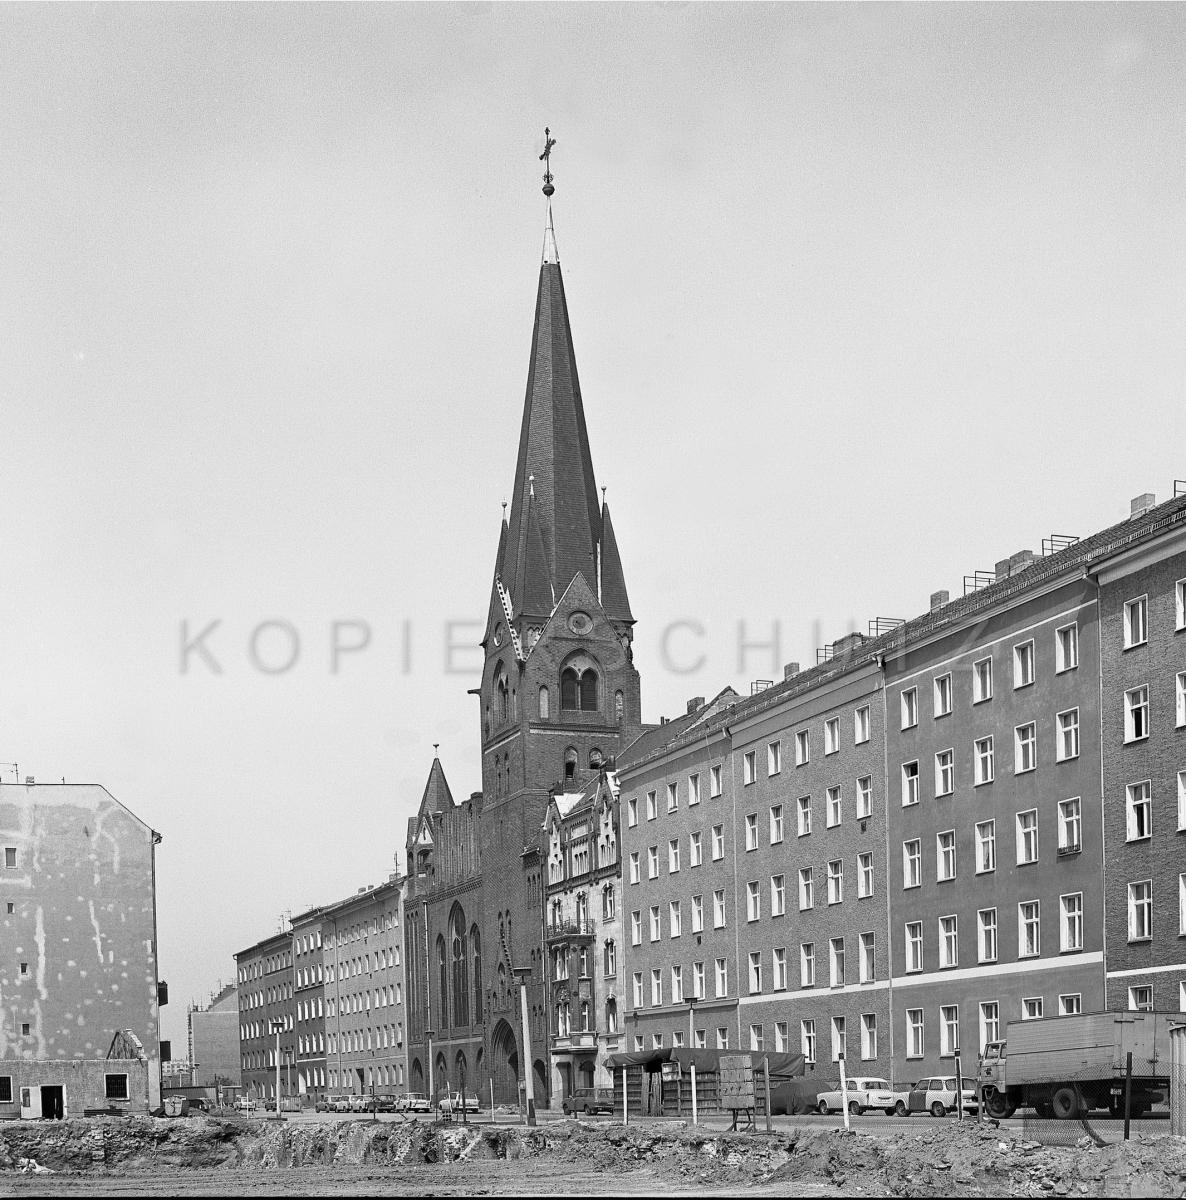 Nr01-015_Borsigstrasse-1985